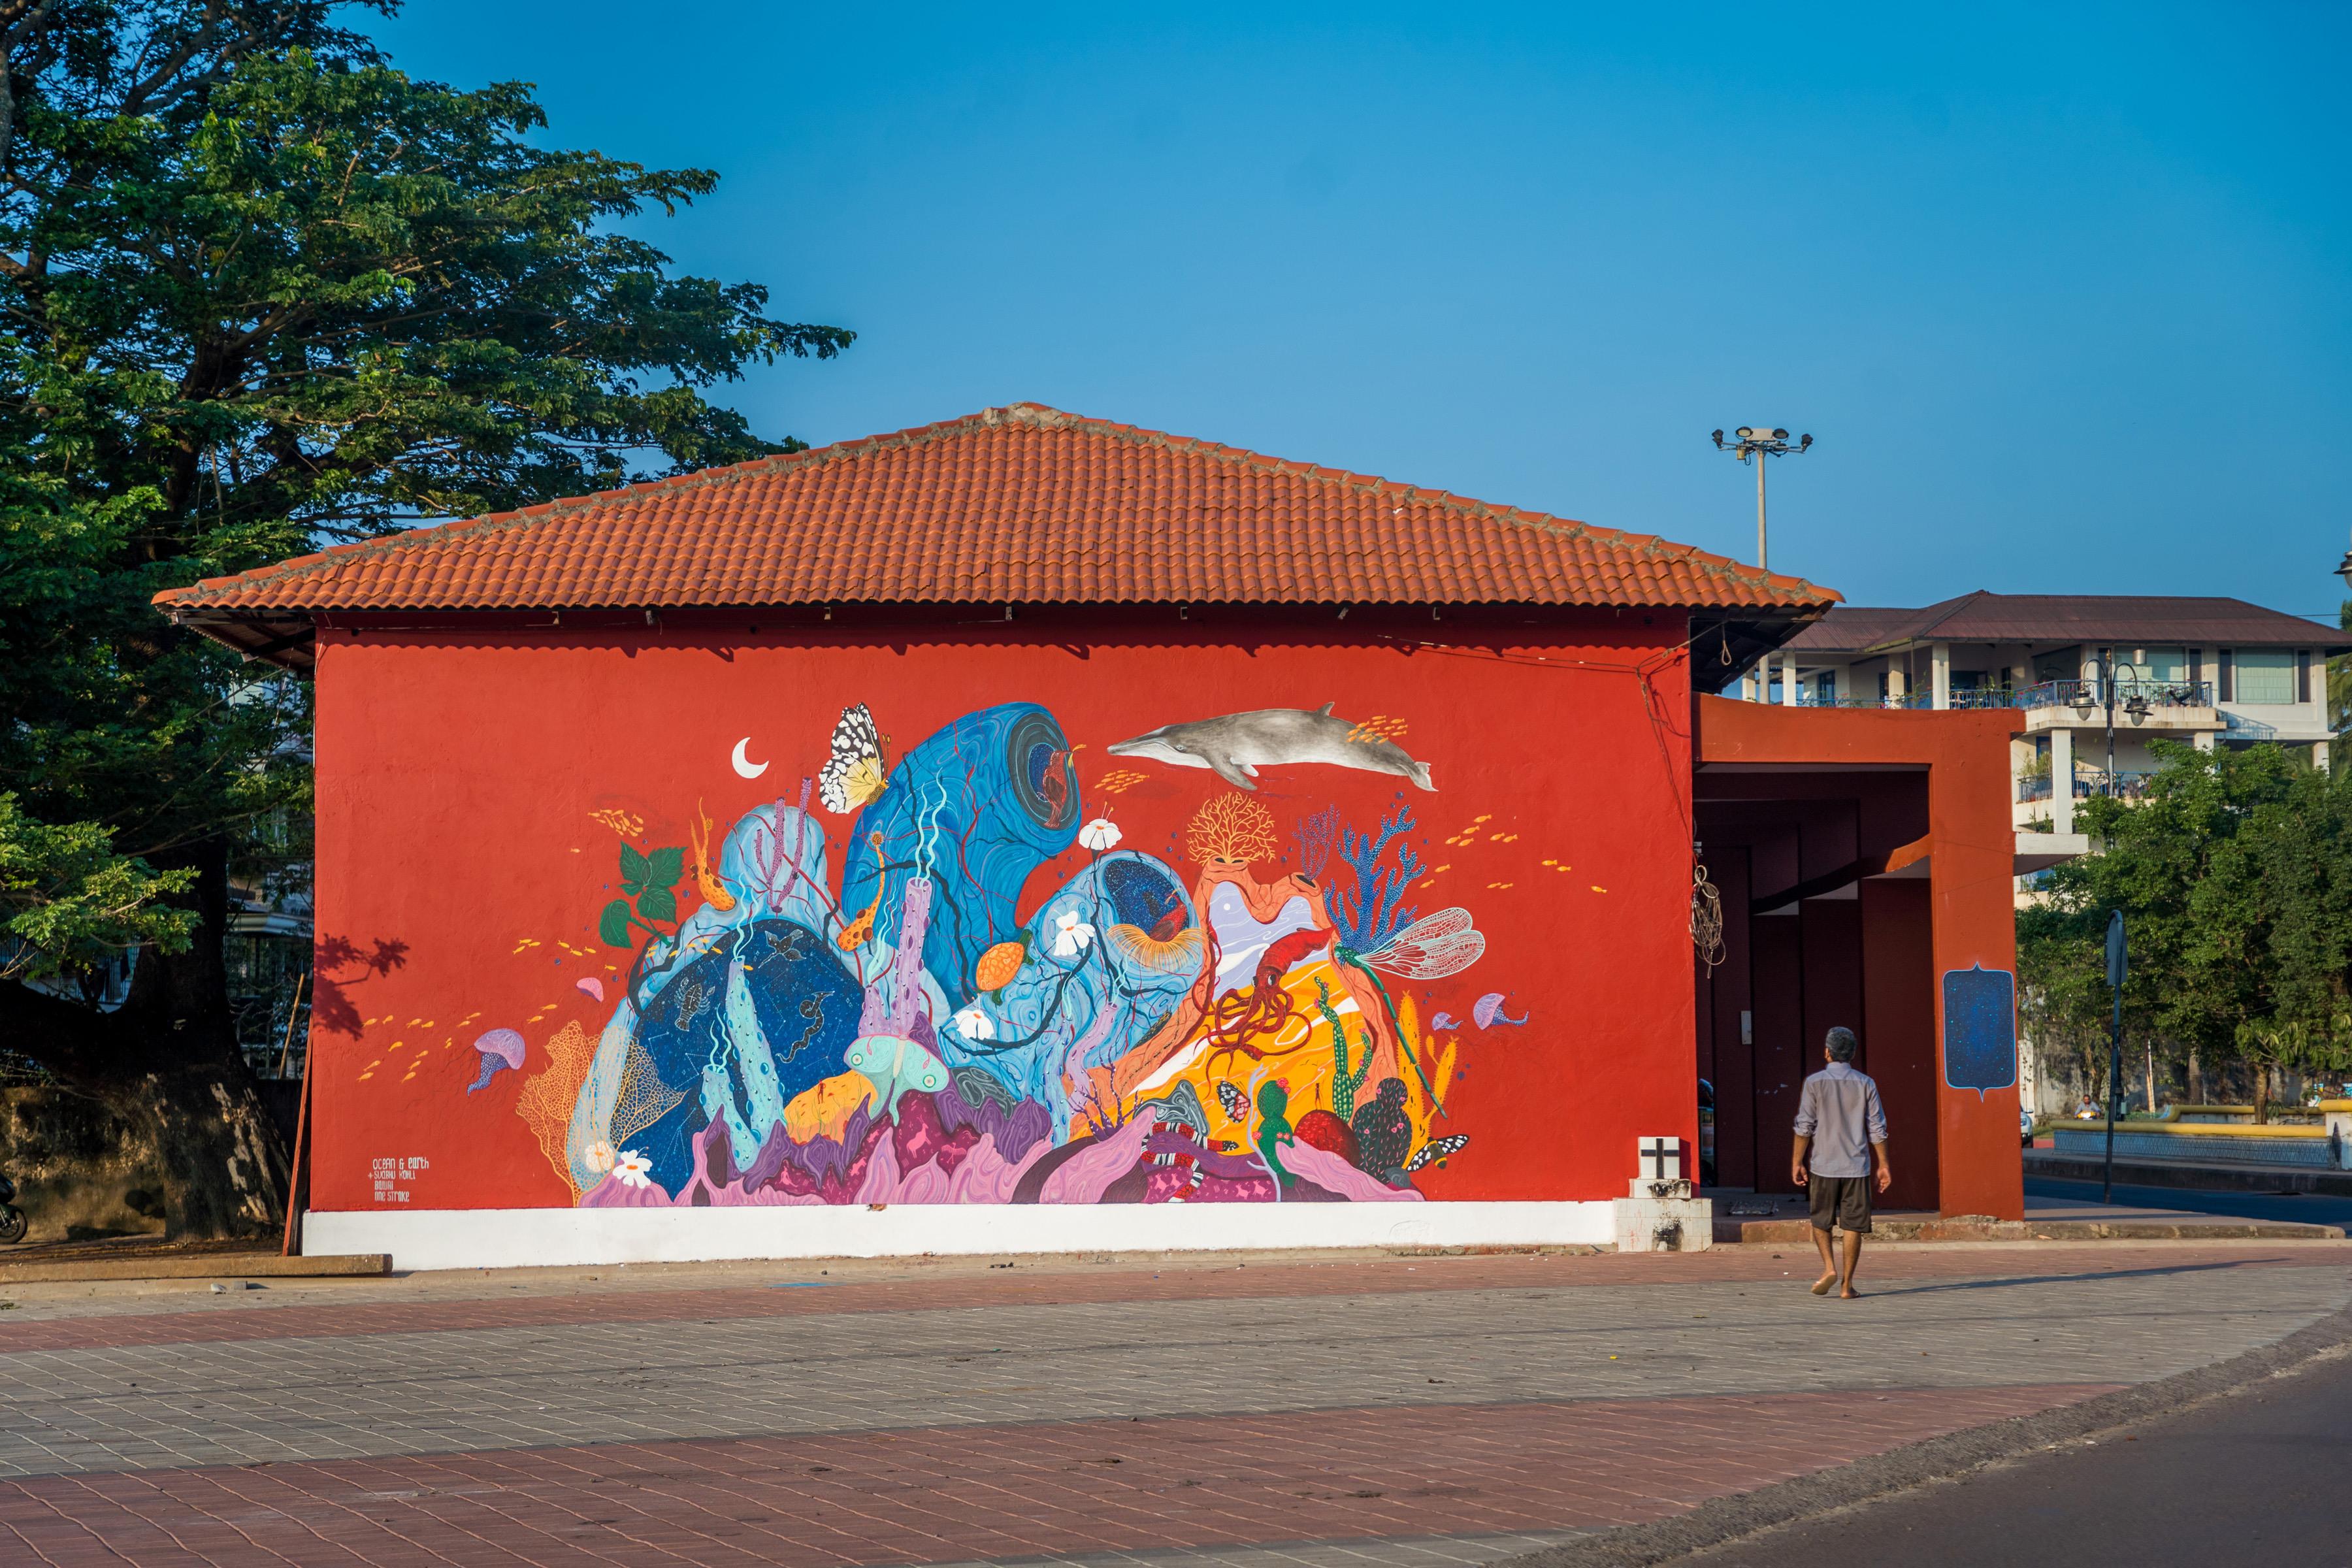 Swabhu Reveals St Art Goa 2019 Pranav Gohil 5